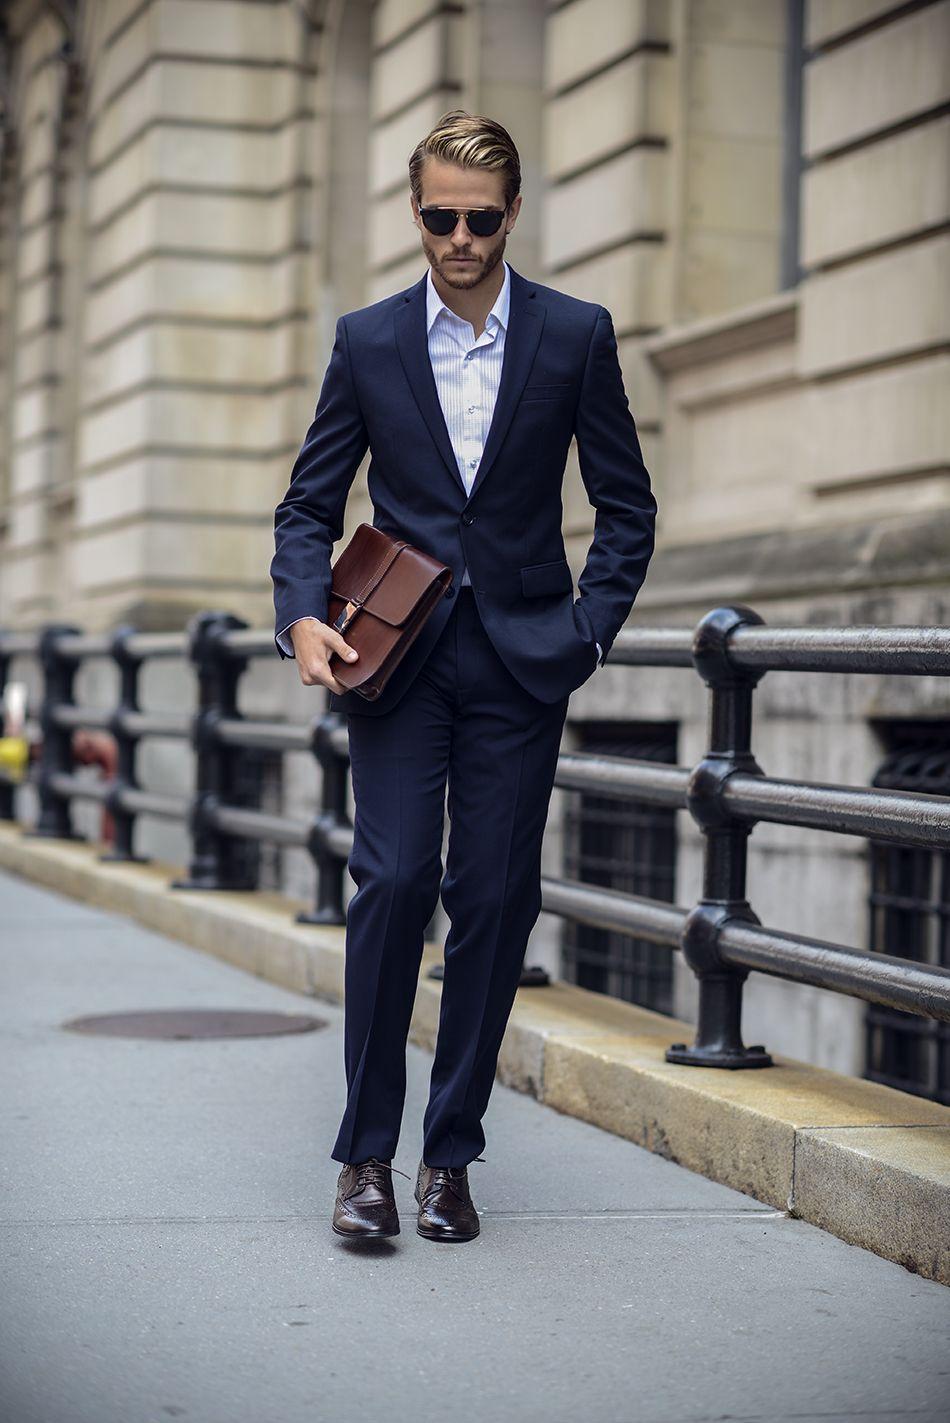 Bar 3 Navy Suit Slim Fit Gingham Shirt Tristan Wing Tip Oxfords